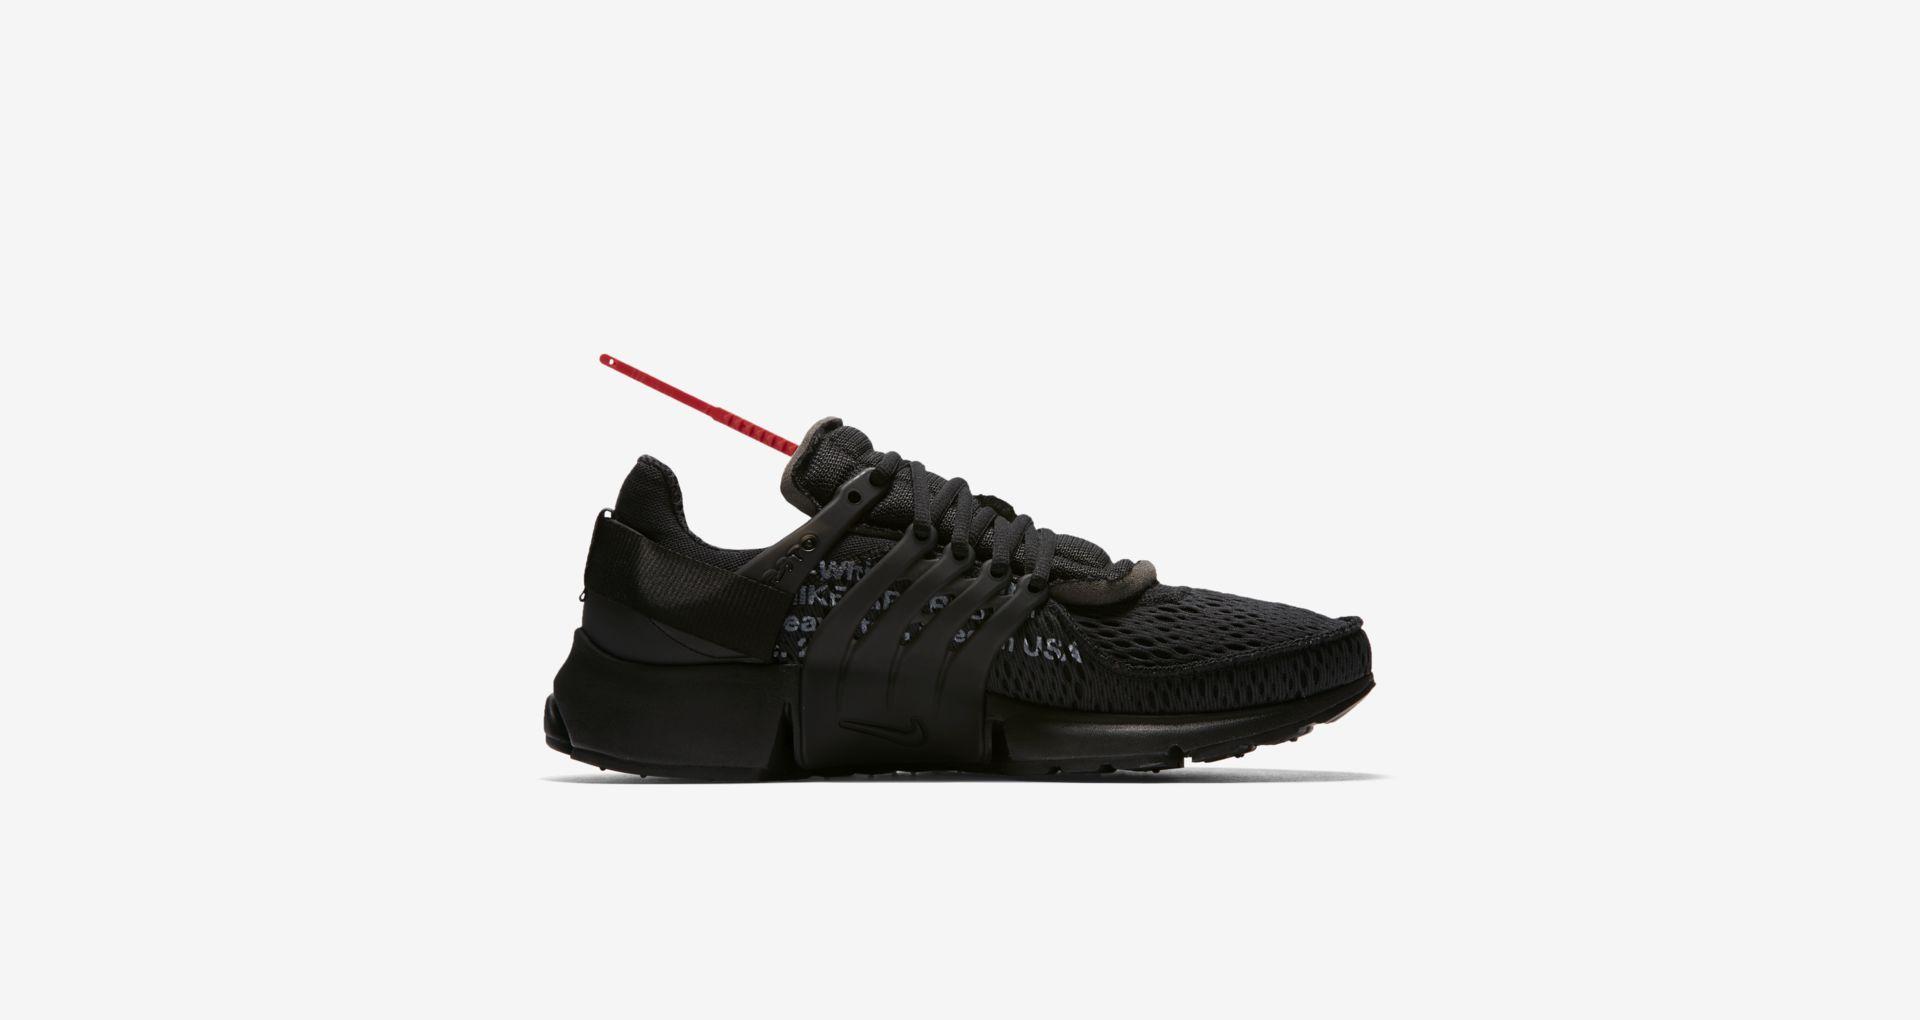 AA3830 002 Off White x Nike Air Presto Black 2